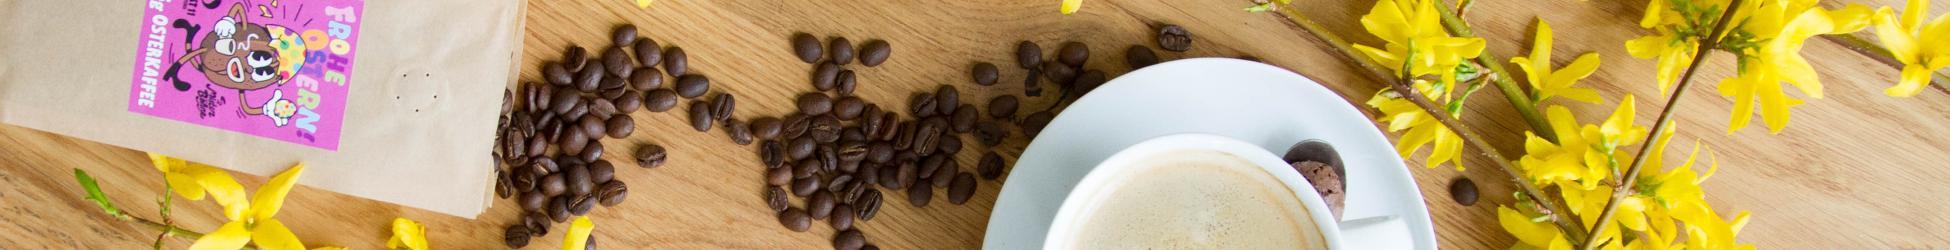 Kaffee & Ostern